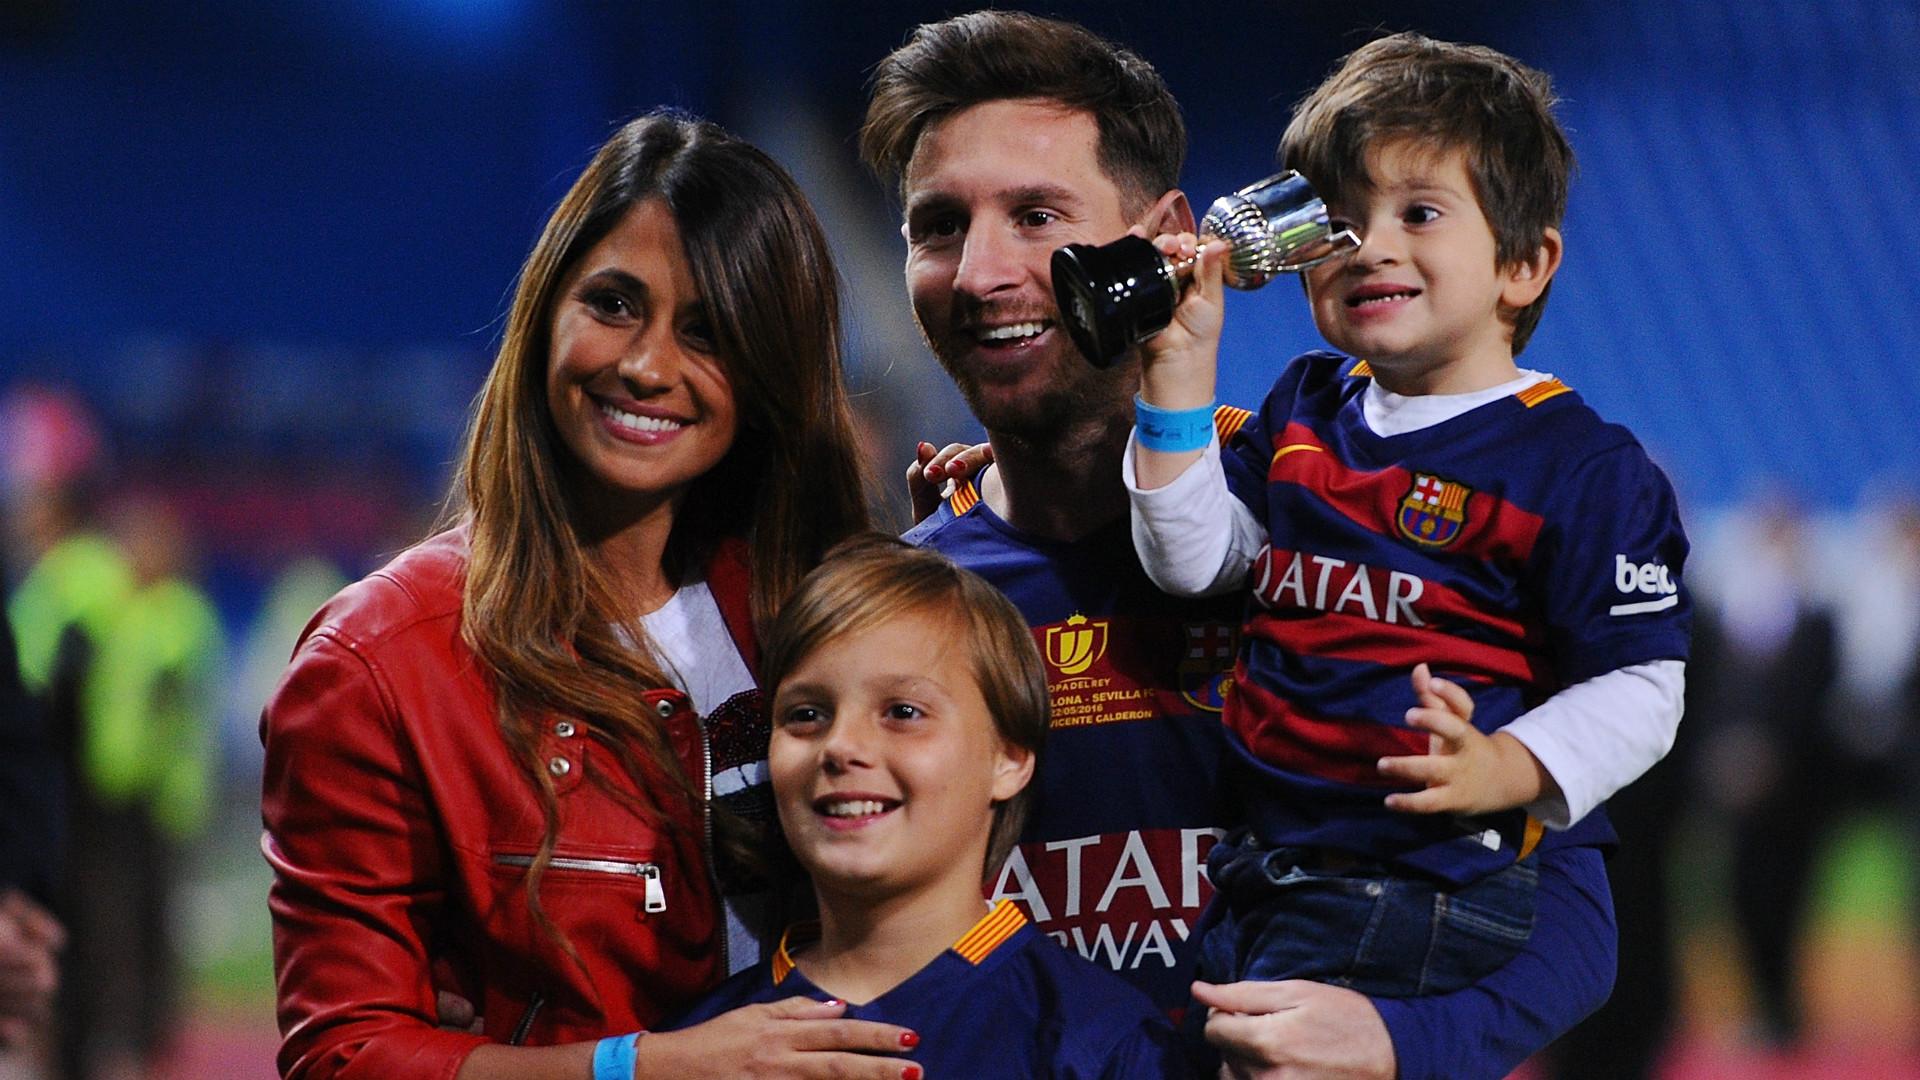 Kisah asmara Lionel Messi dengan Antonella Roccuzzo